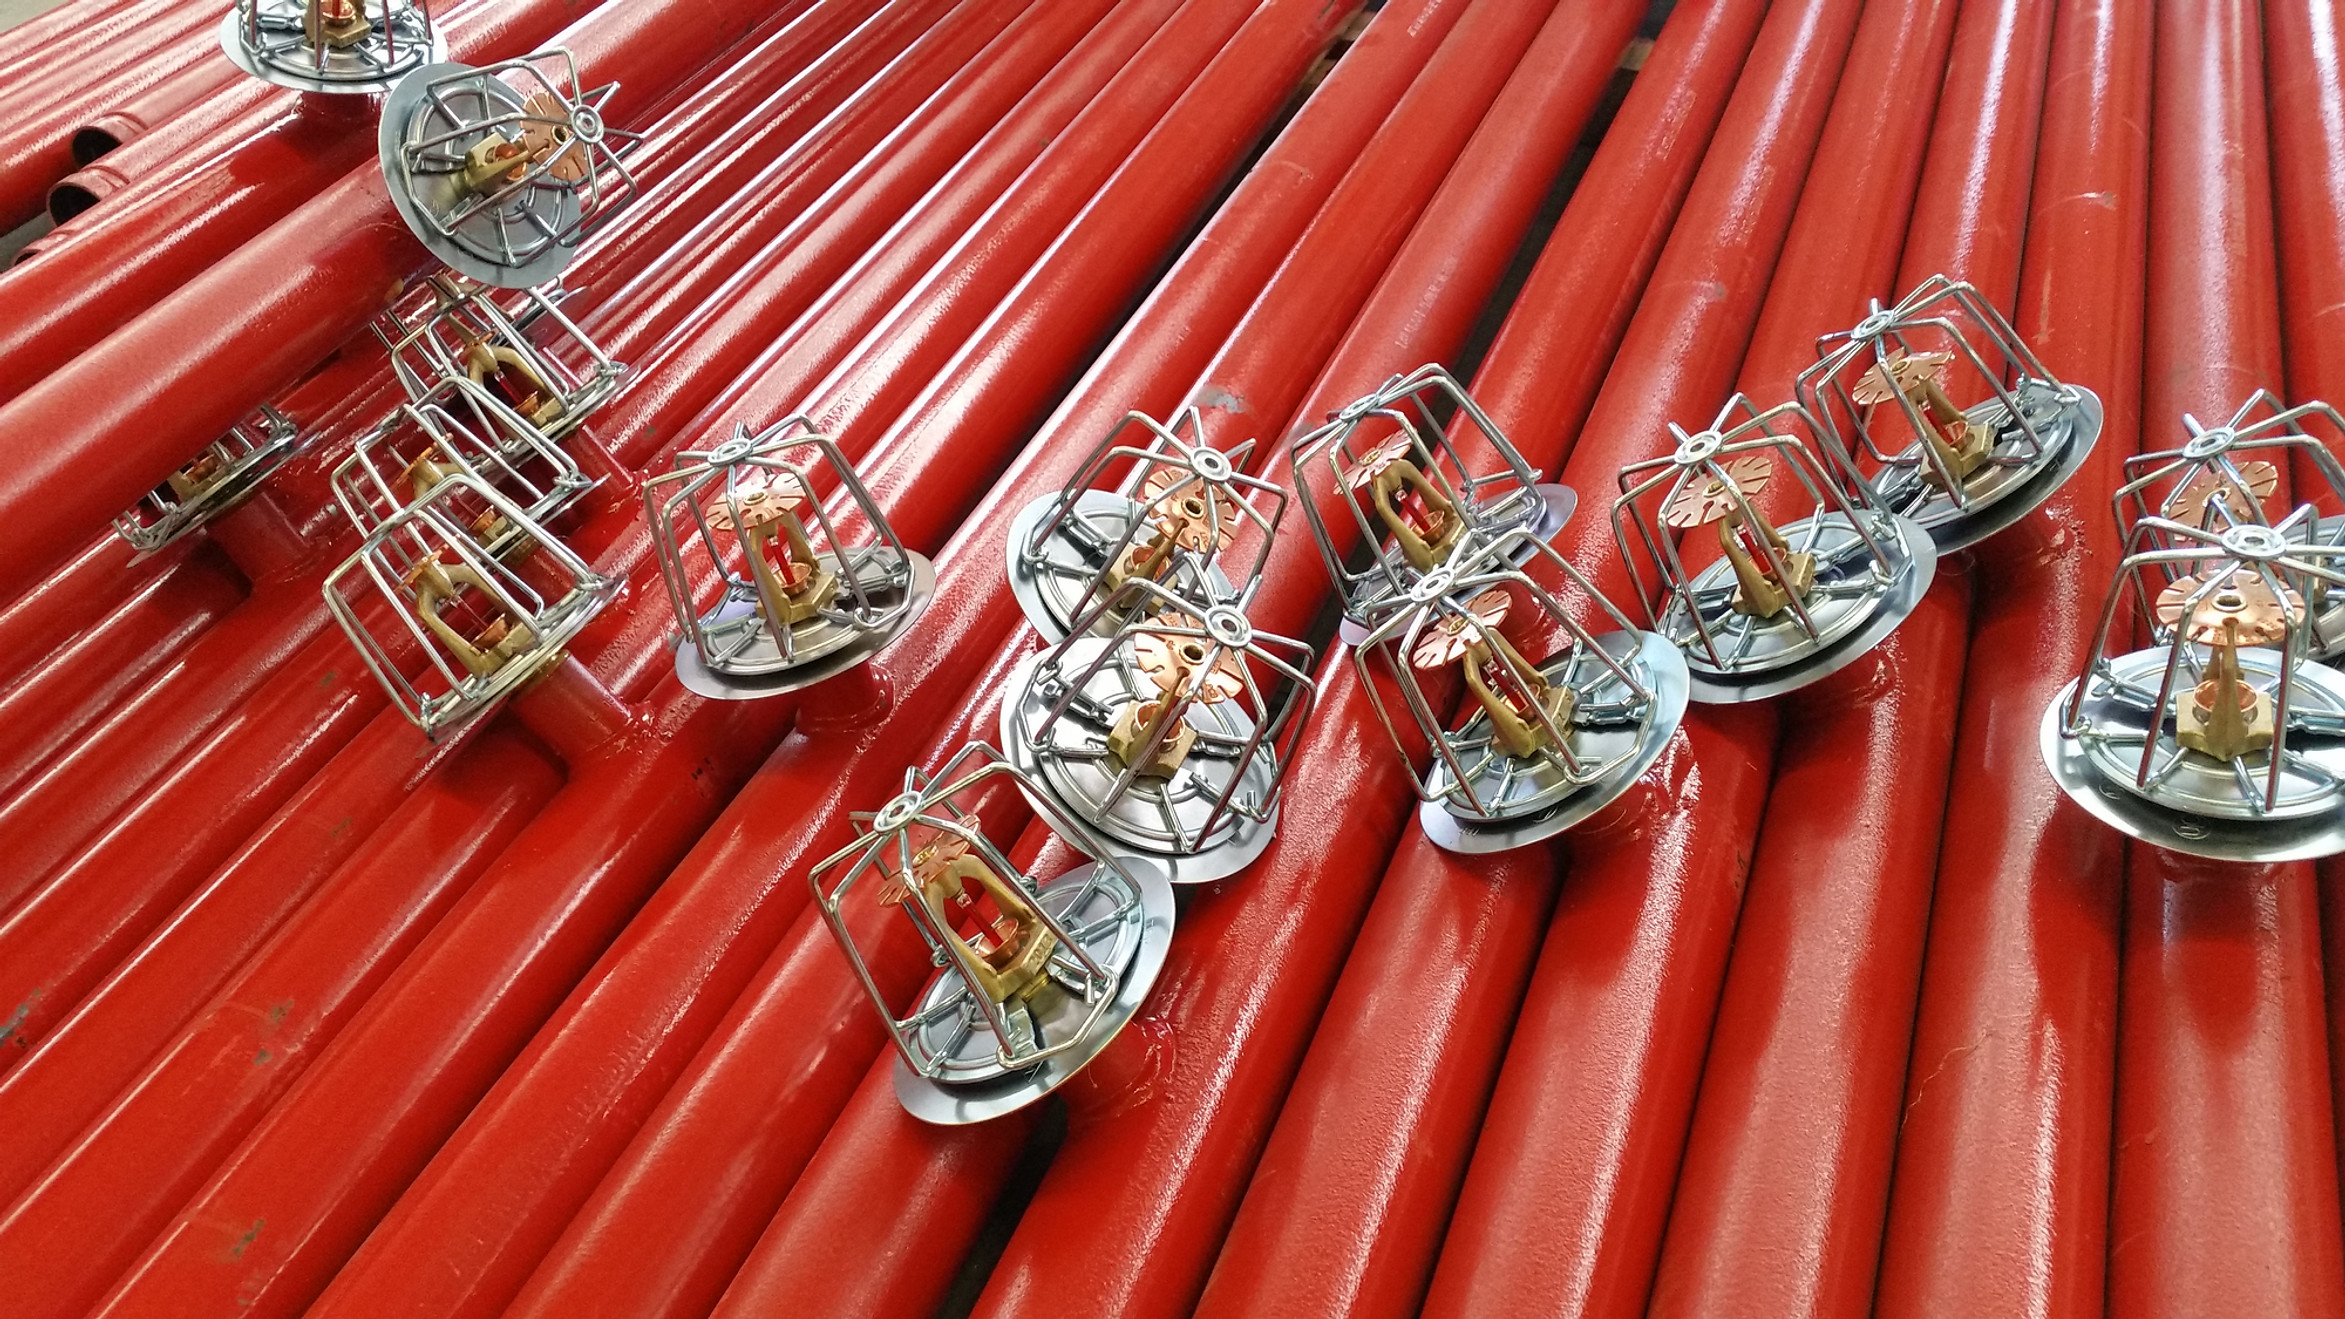 fire pump parts